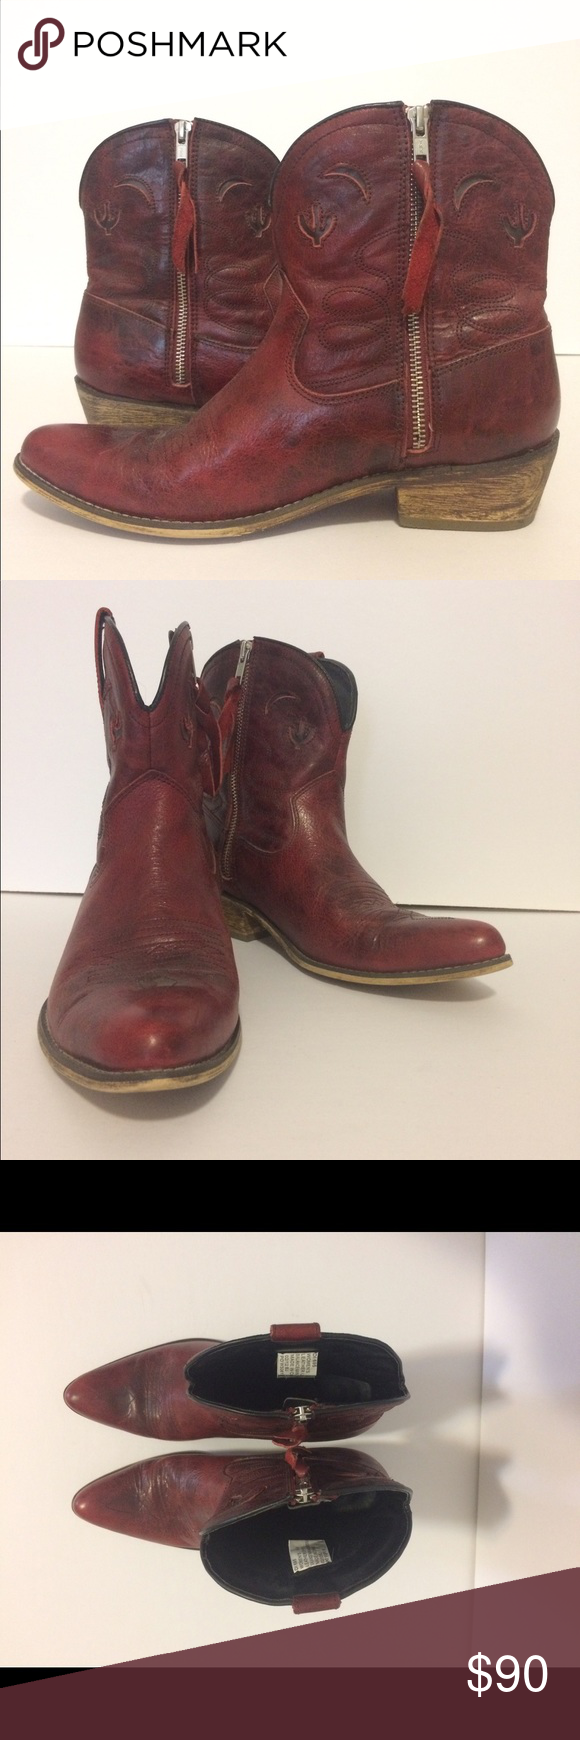 9c9d5807a30 Dingo LAD dark red cowboy short boots Red leather short cowboy ...